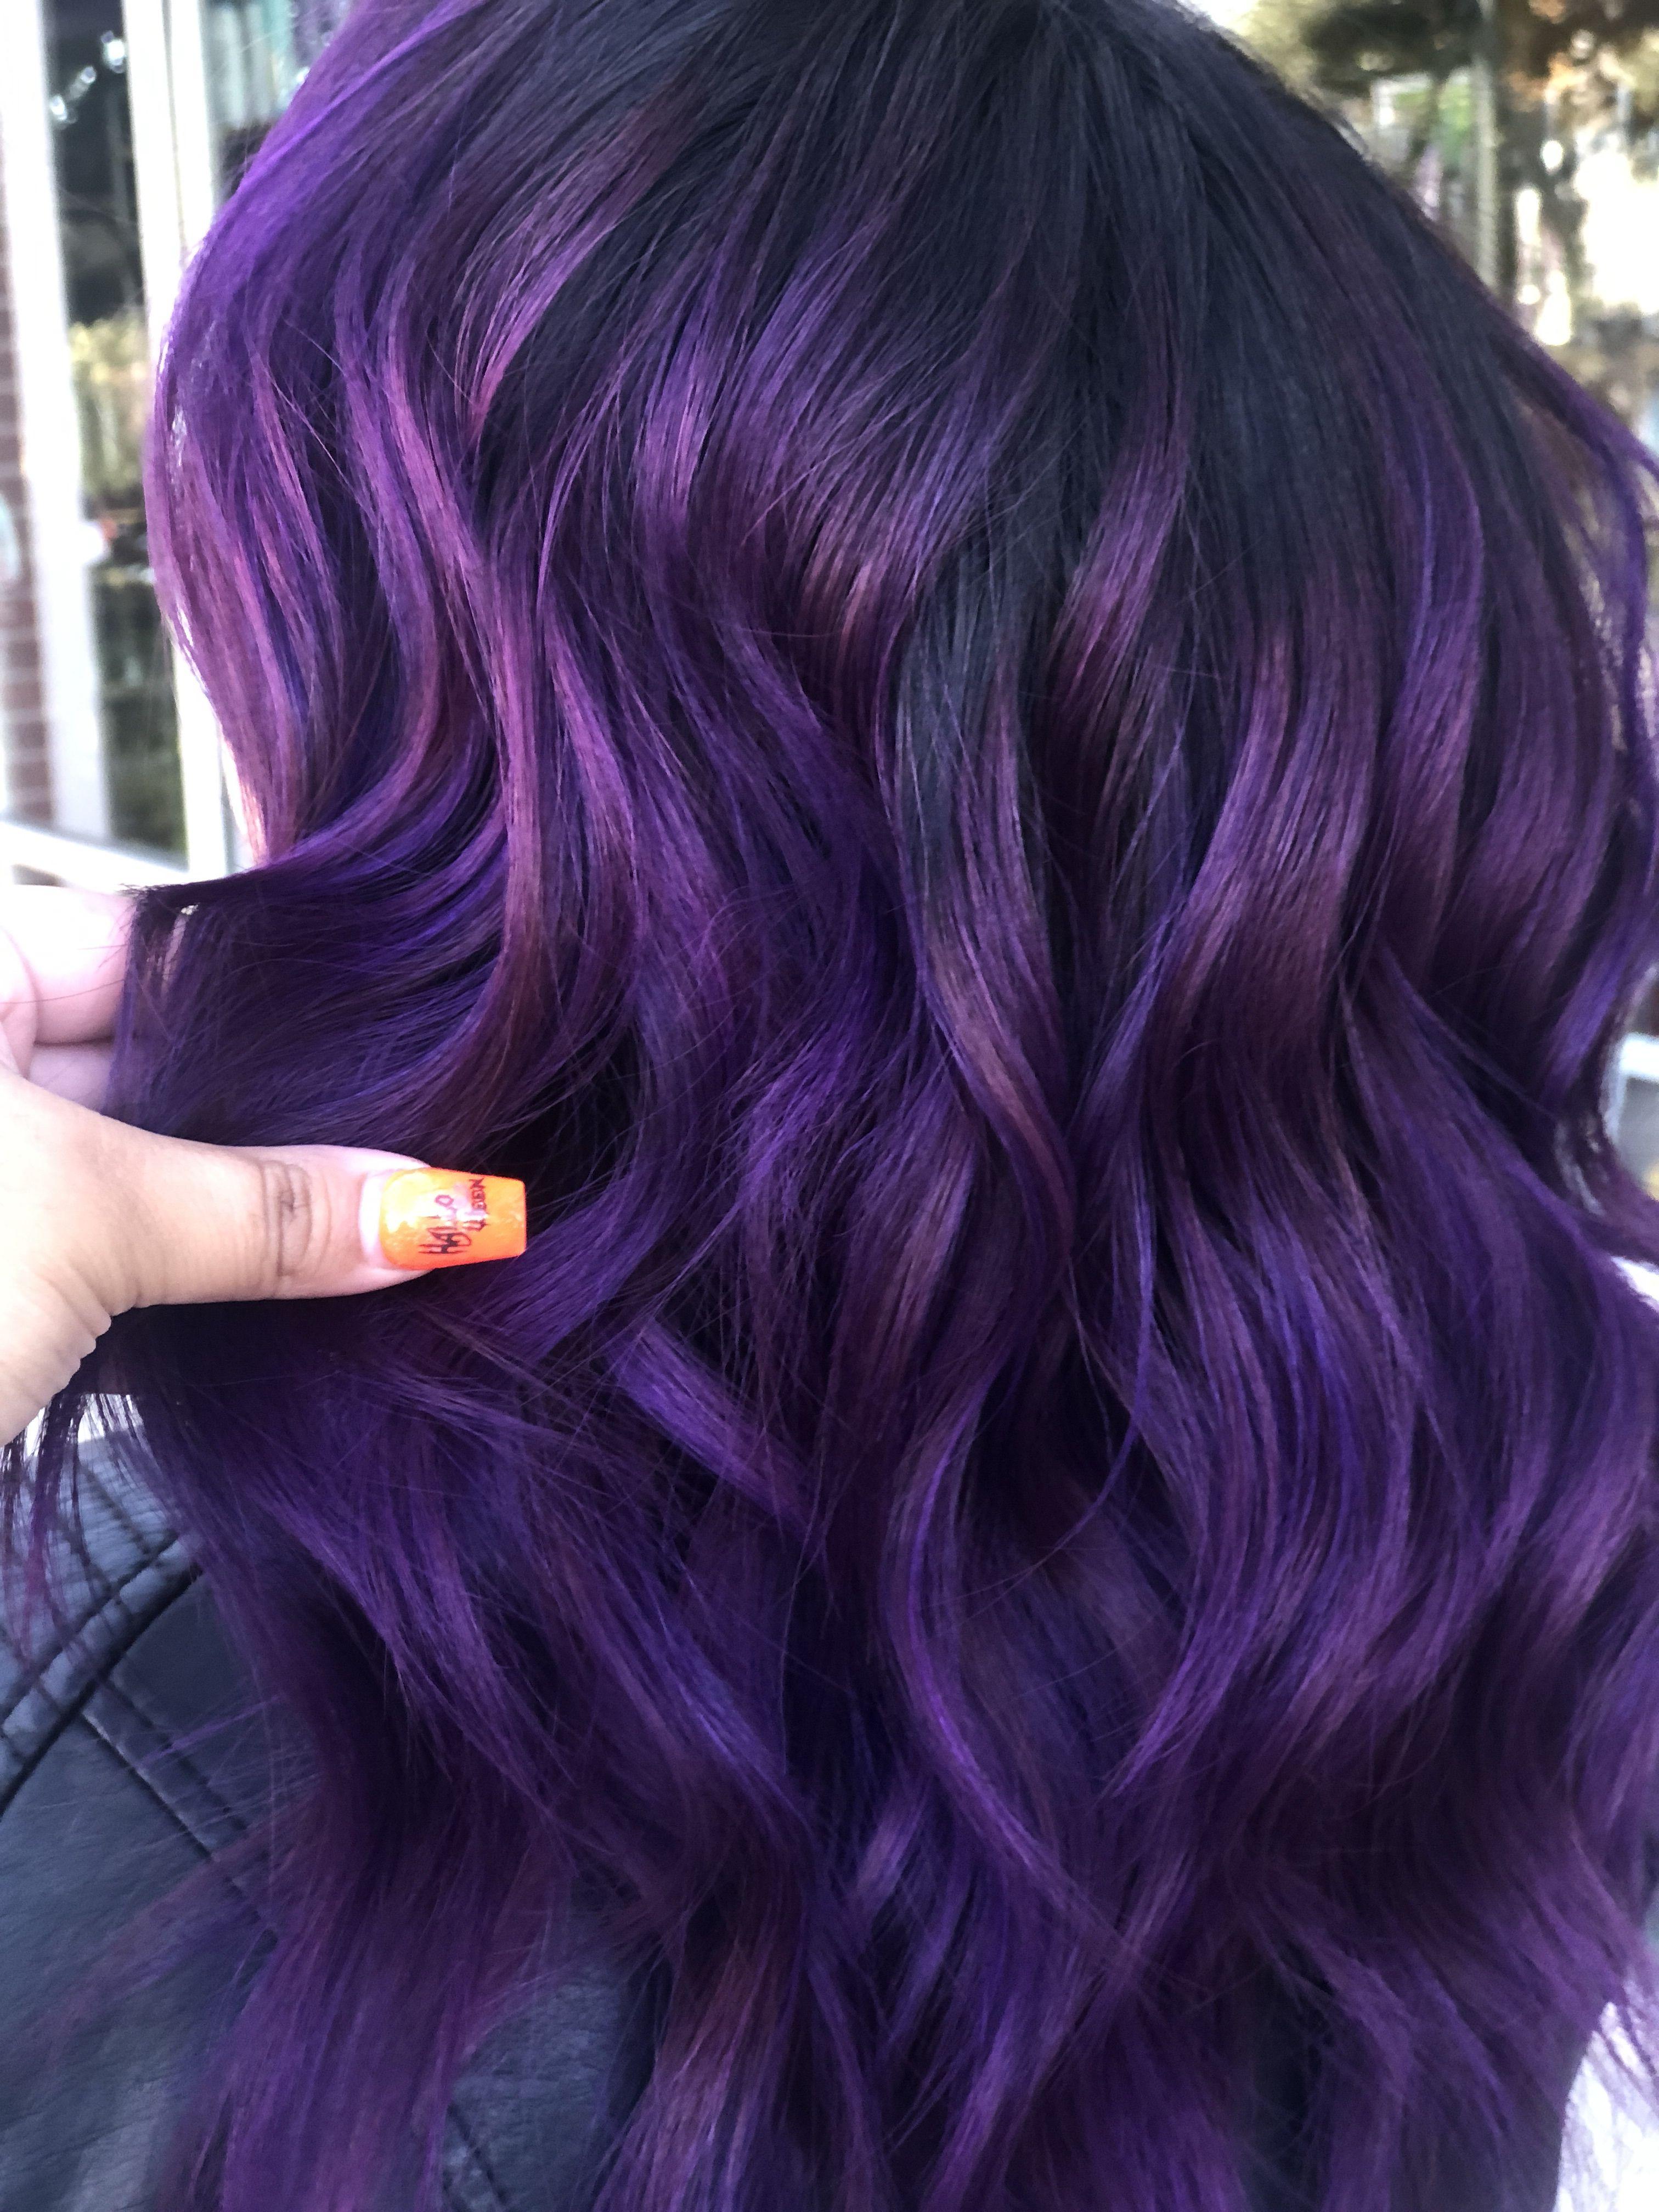 Eggplant Hair Color Eggplant Colored Hair Cool Hair Color Hair Dye Colors